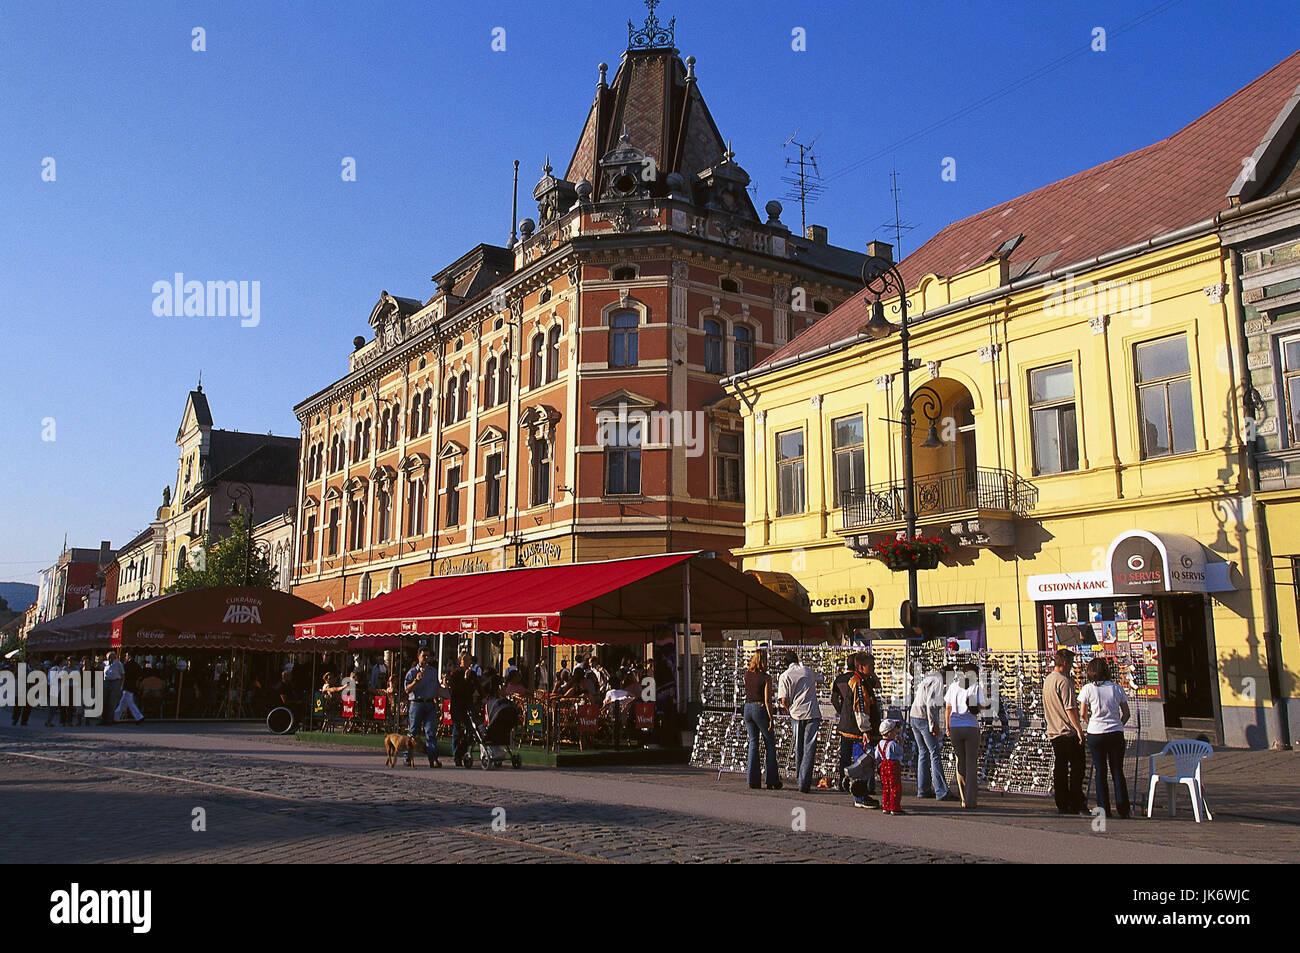 Slowakei, Region Spis, Kosice,  Hlavna ulica, Straßenverkauf, Touristen  Europa,  Slowakische Republik, Slovenská - Stock Image